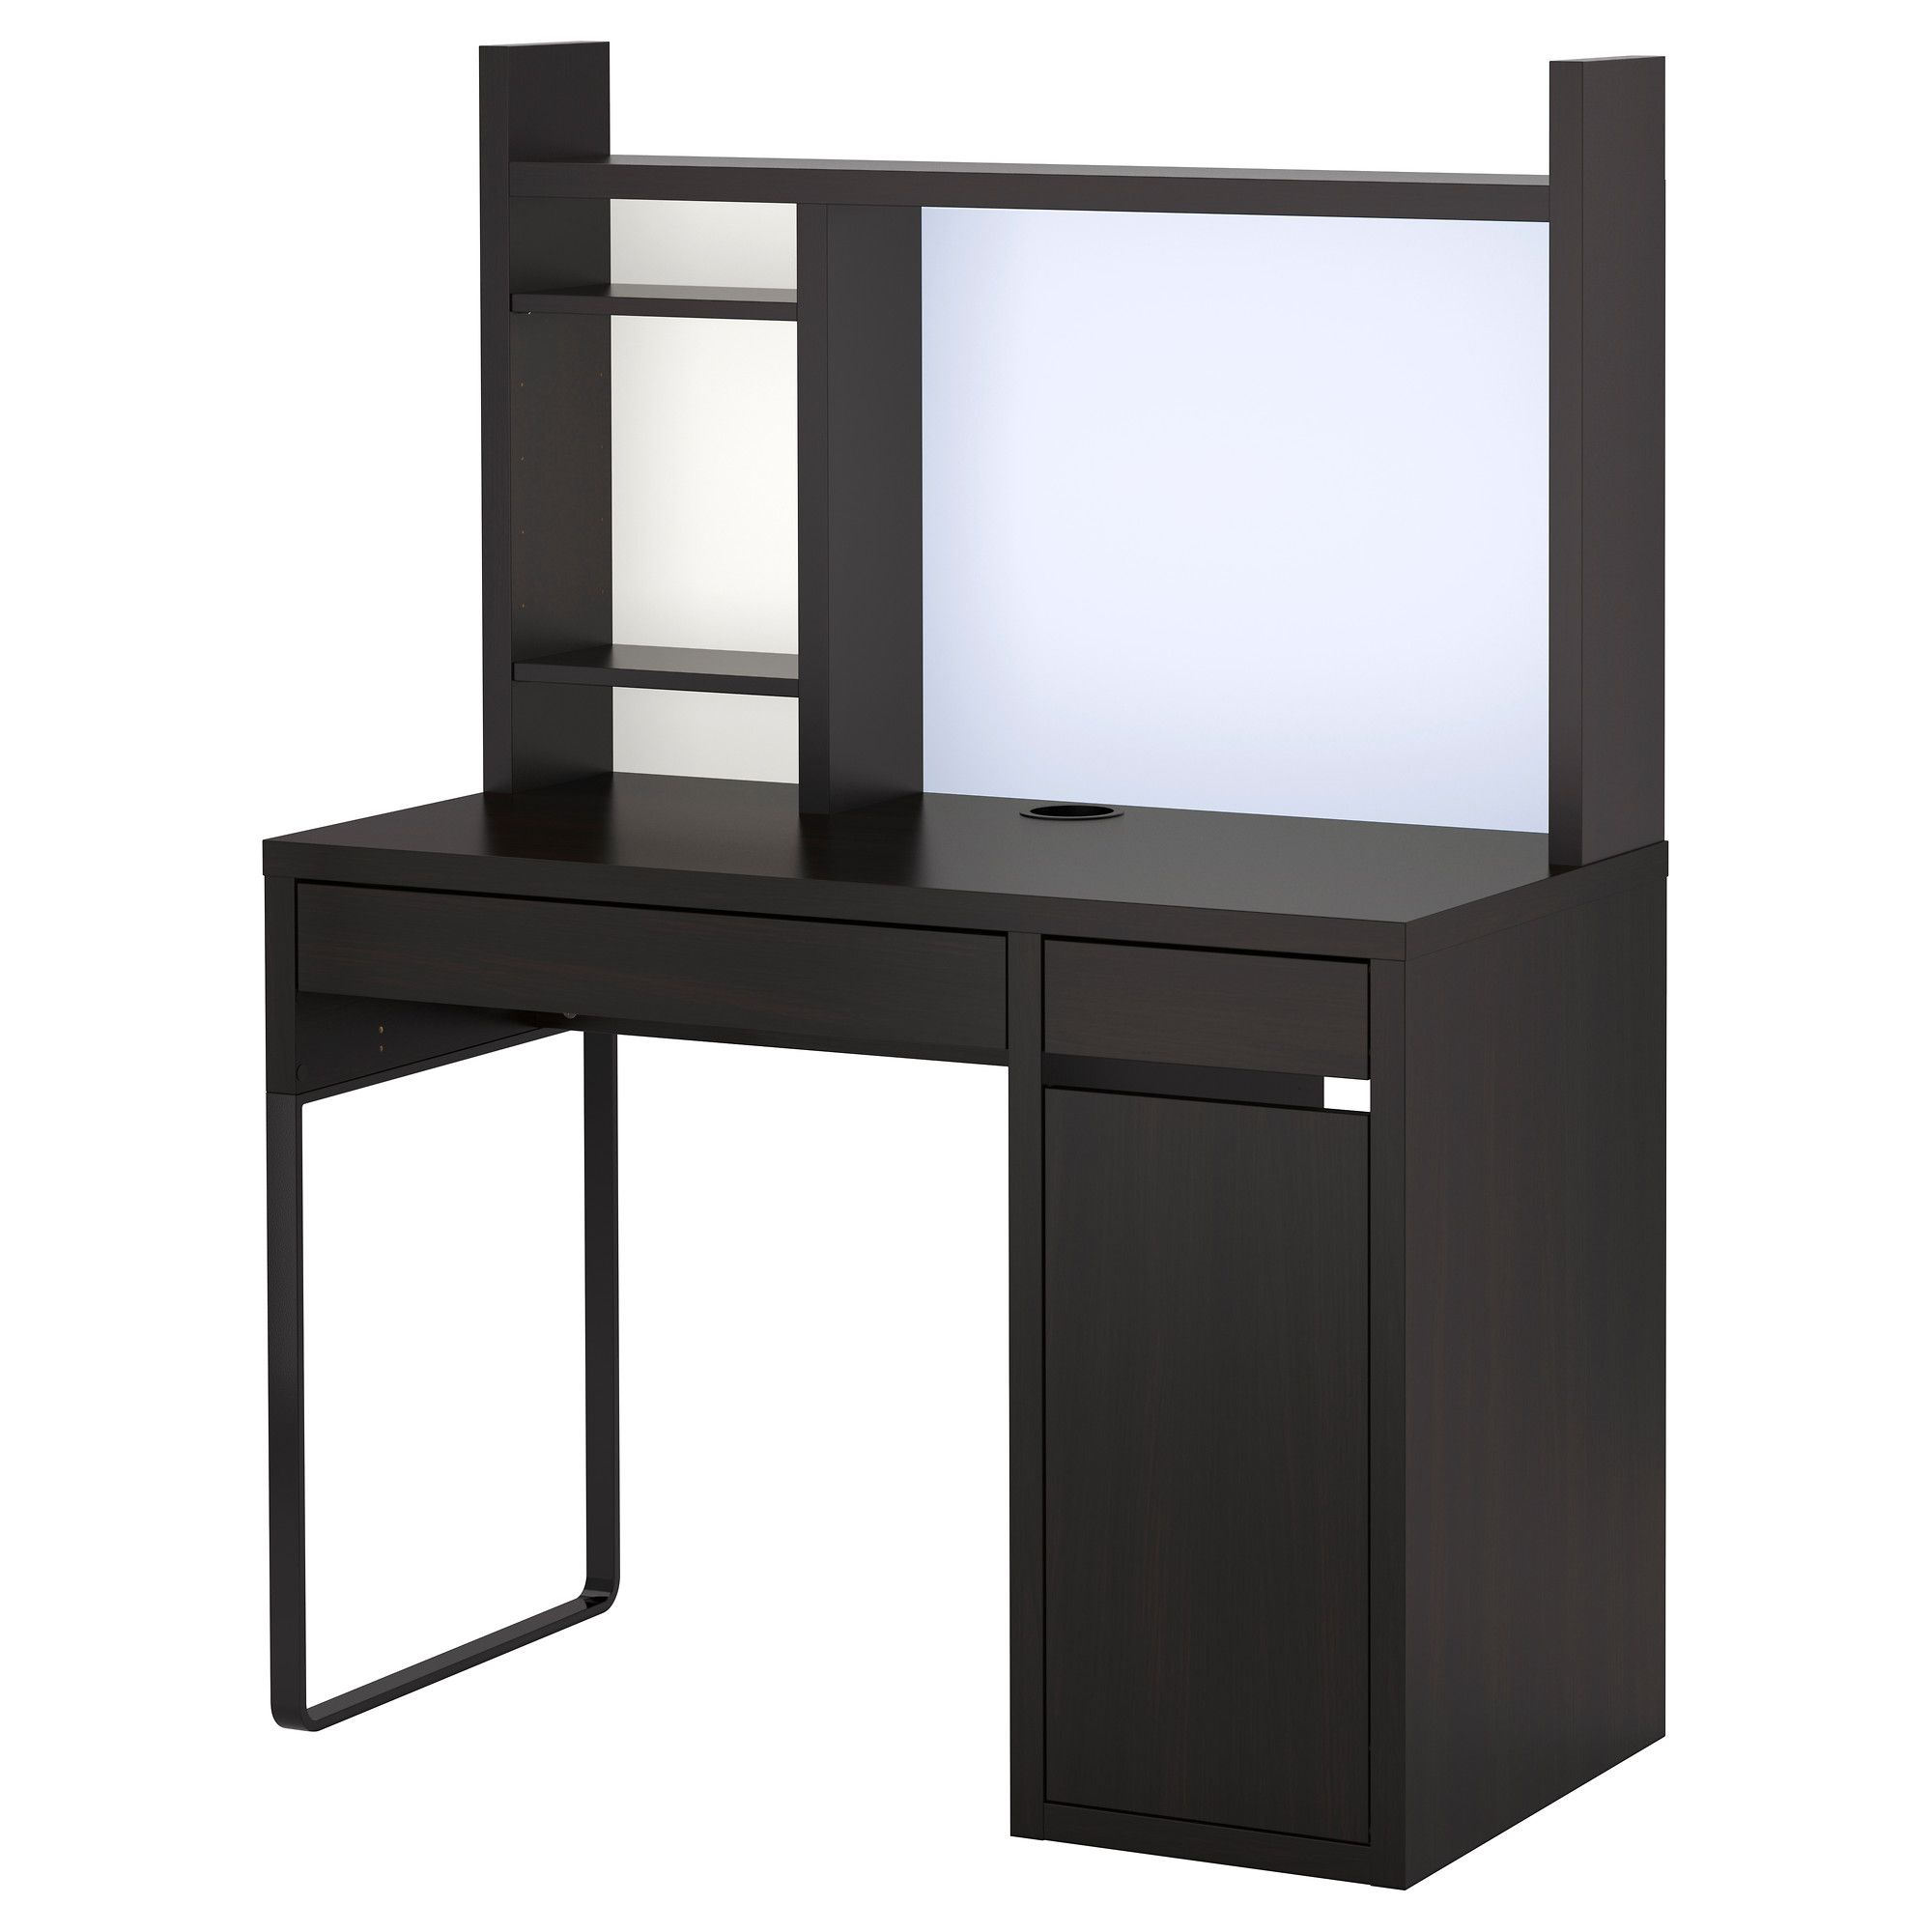 Micke Desk Black Brown 105x50 Cm Ikea Canada Ikea In 2020 Ikea Ikea Micke Micke Desk